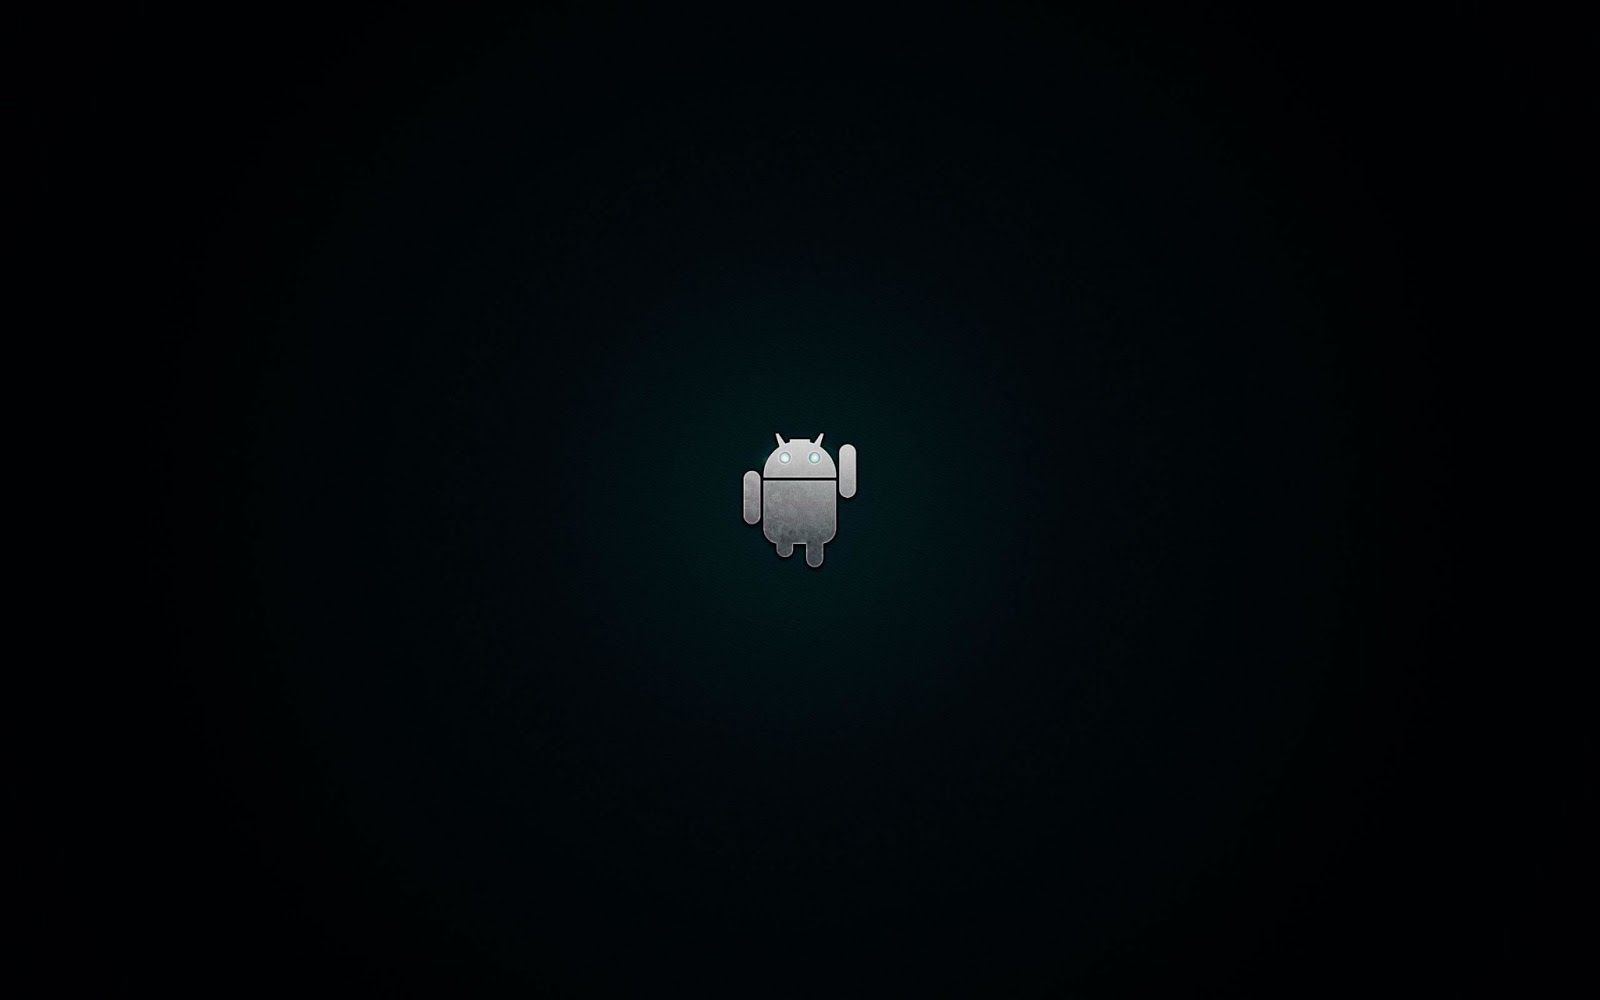 black wallpaper android all black wallpaper android rare black 1600x1000